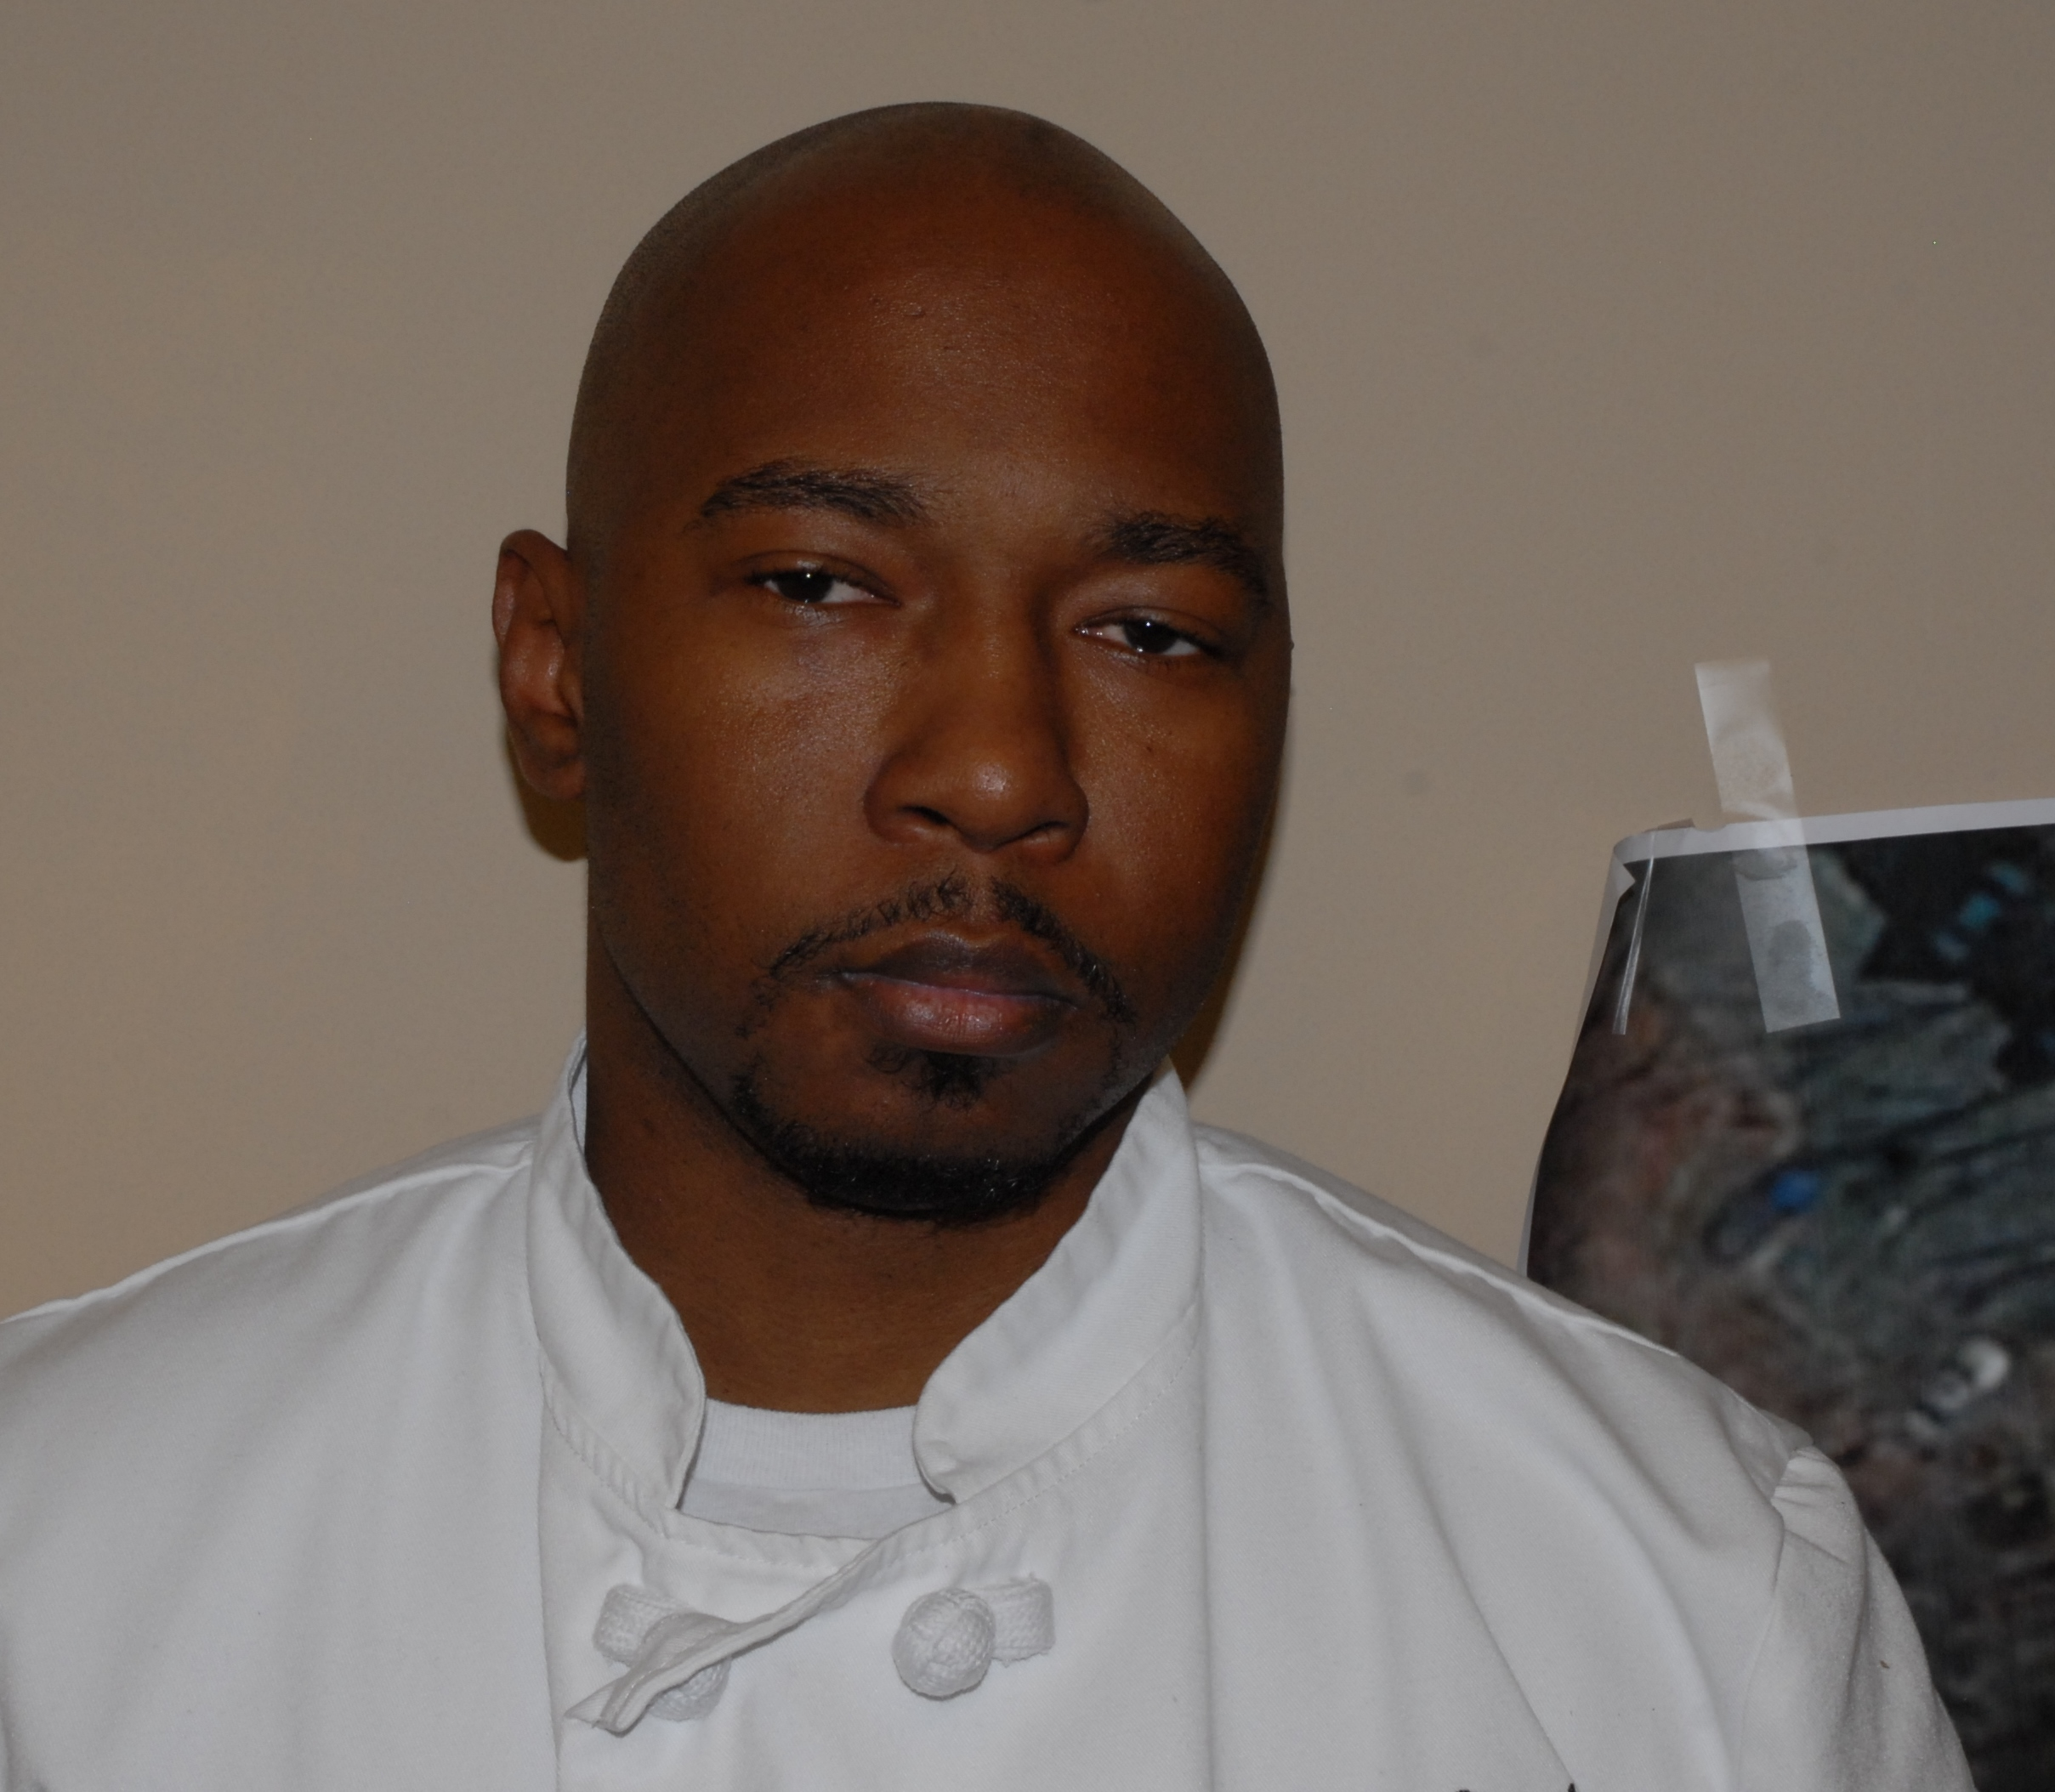 Dillon Ledford Mugshot   09/19/12 North Carolina Arrest